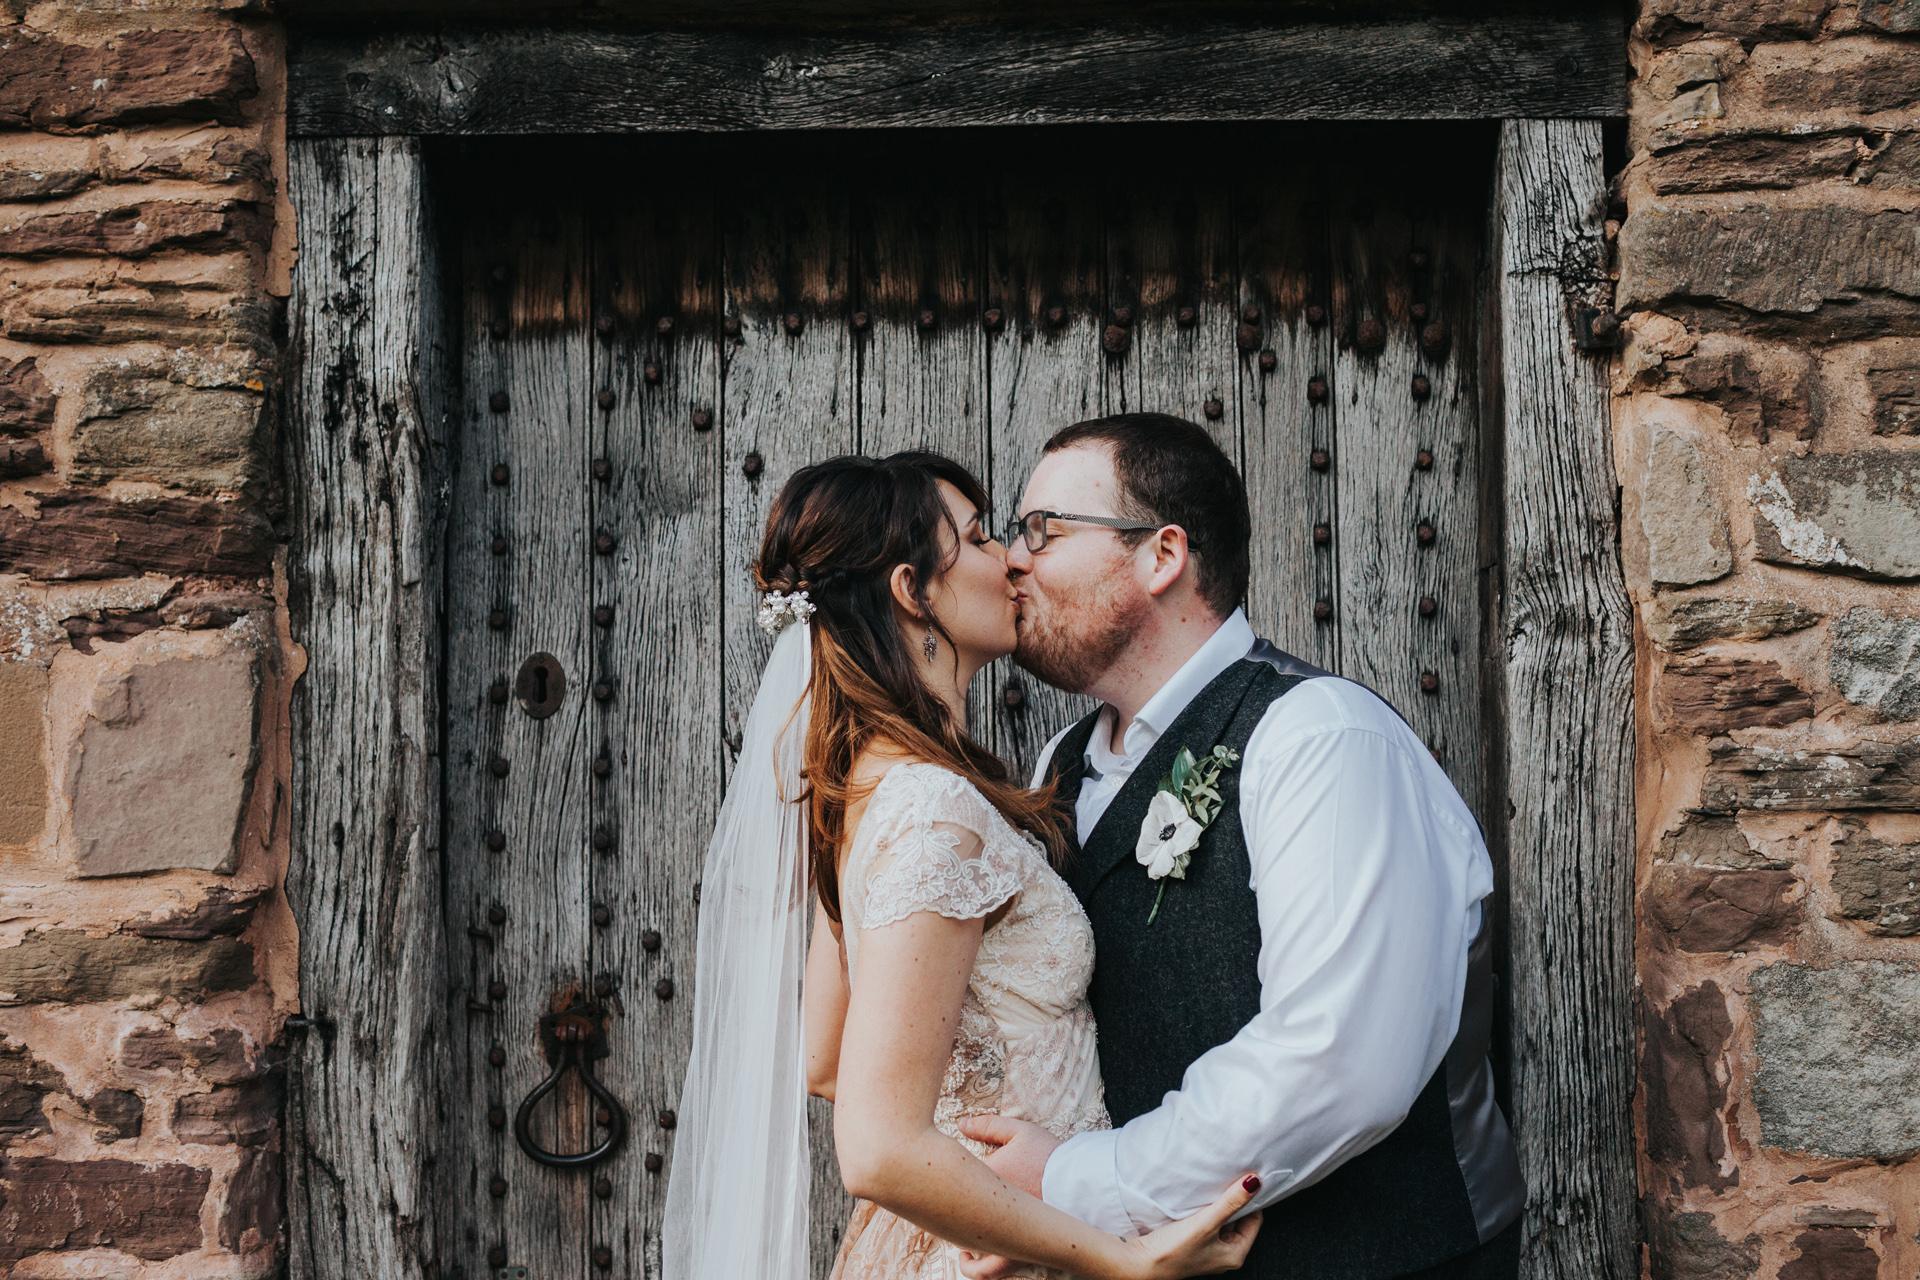 Bride and groom kiss.